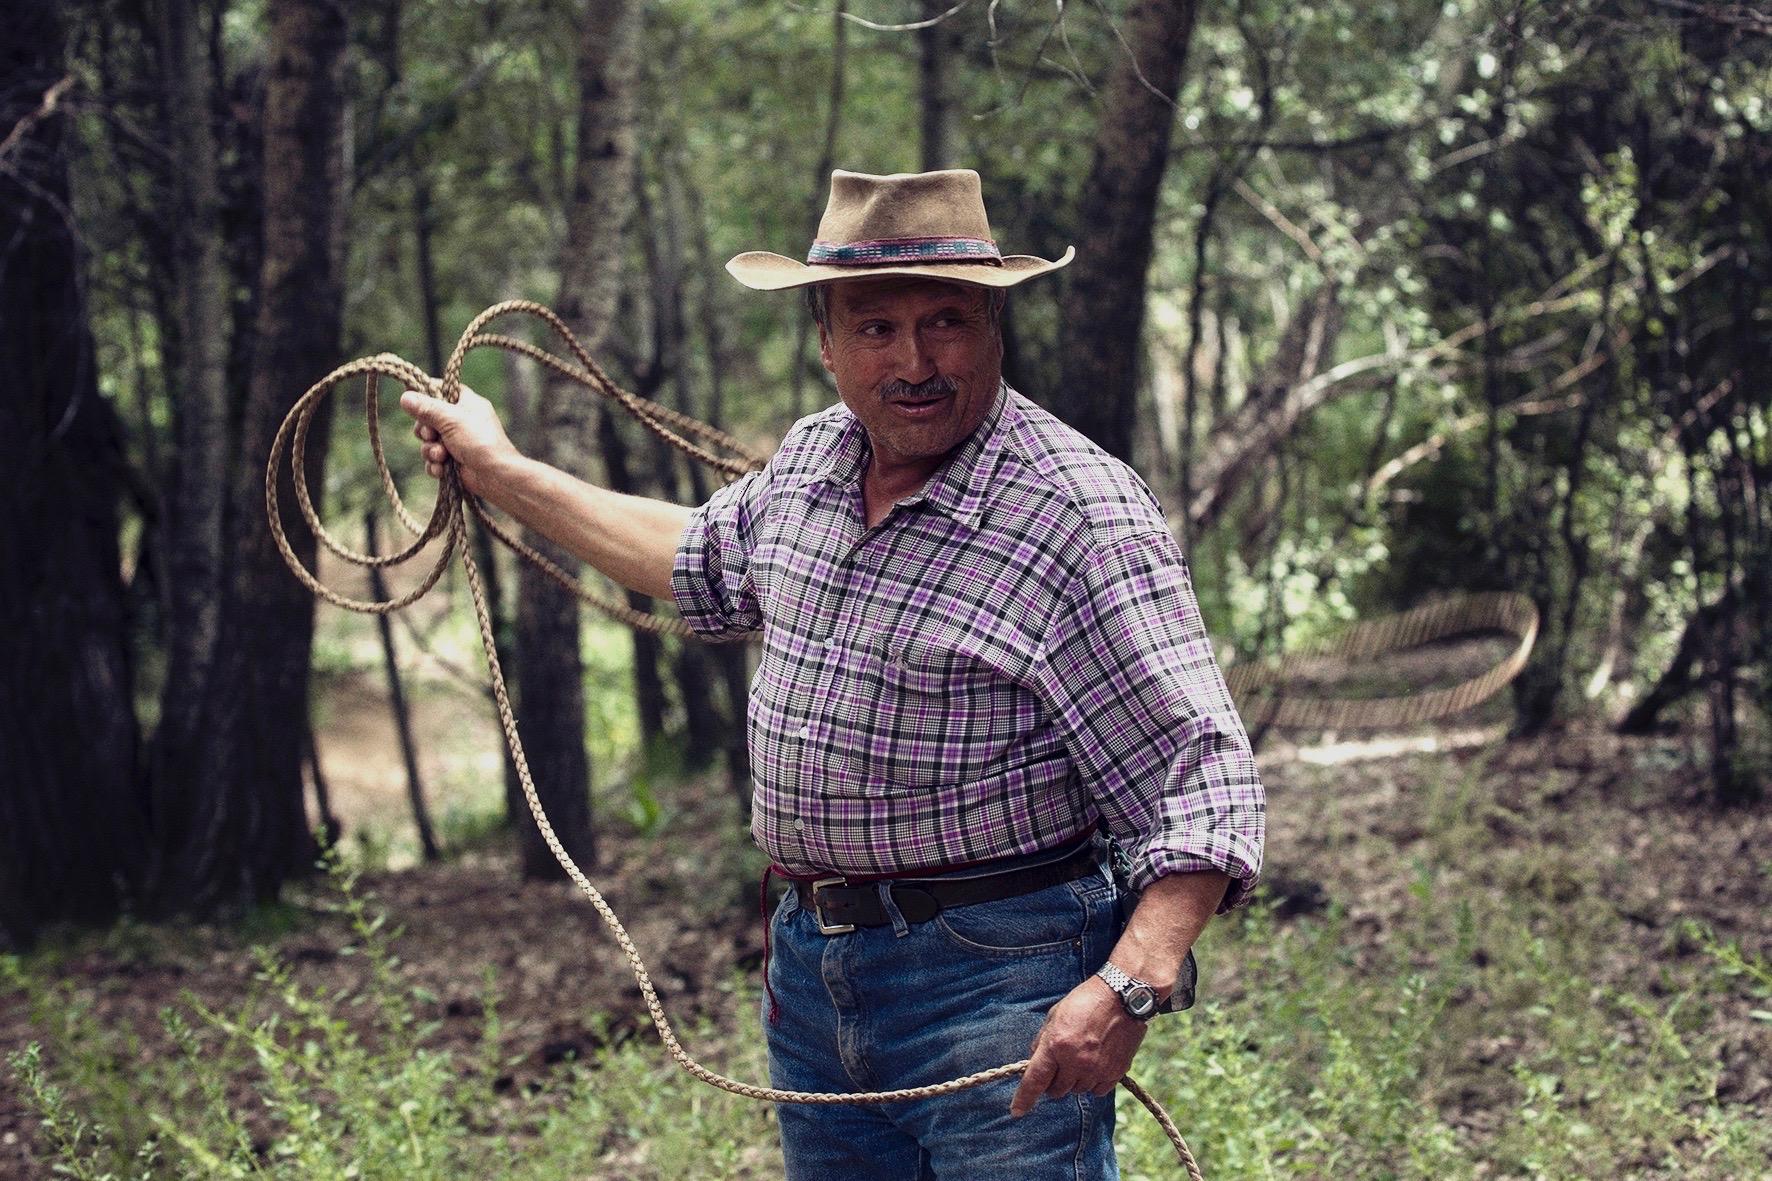 Gaucho throwing lasso in corral at Estancia Ranquilco ranch in Patagonia Argentina